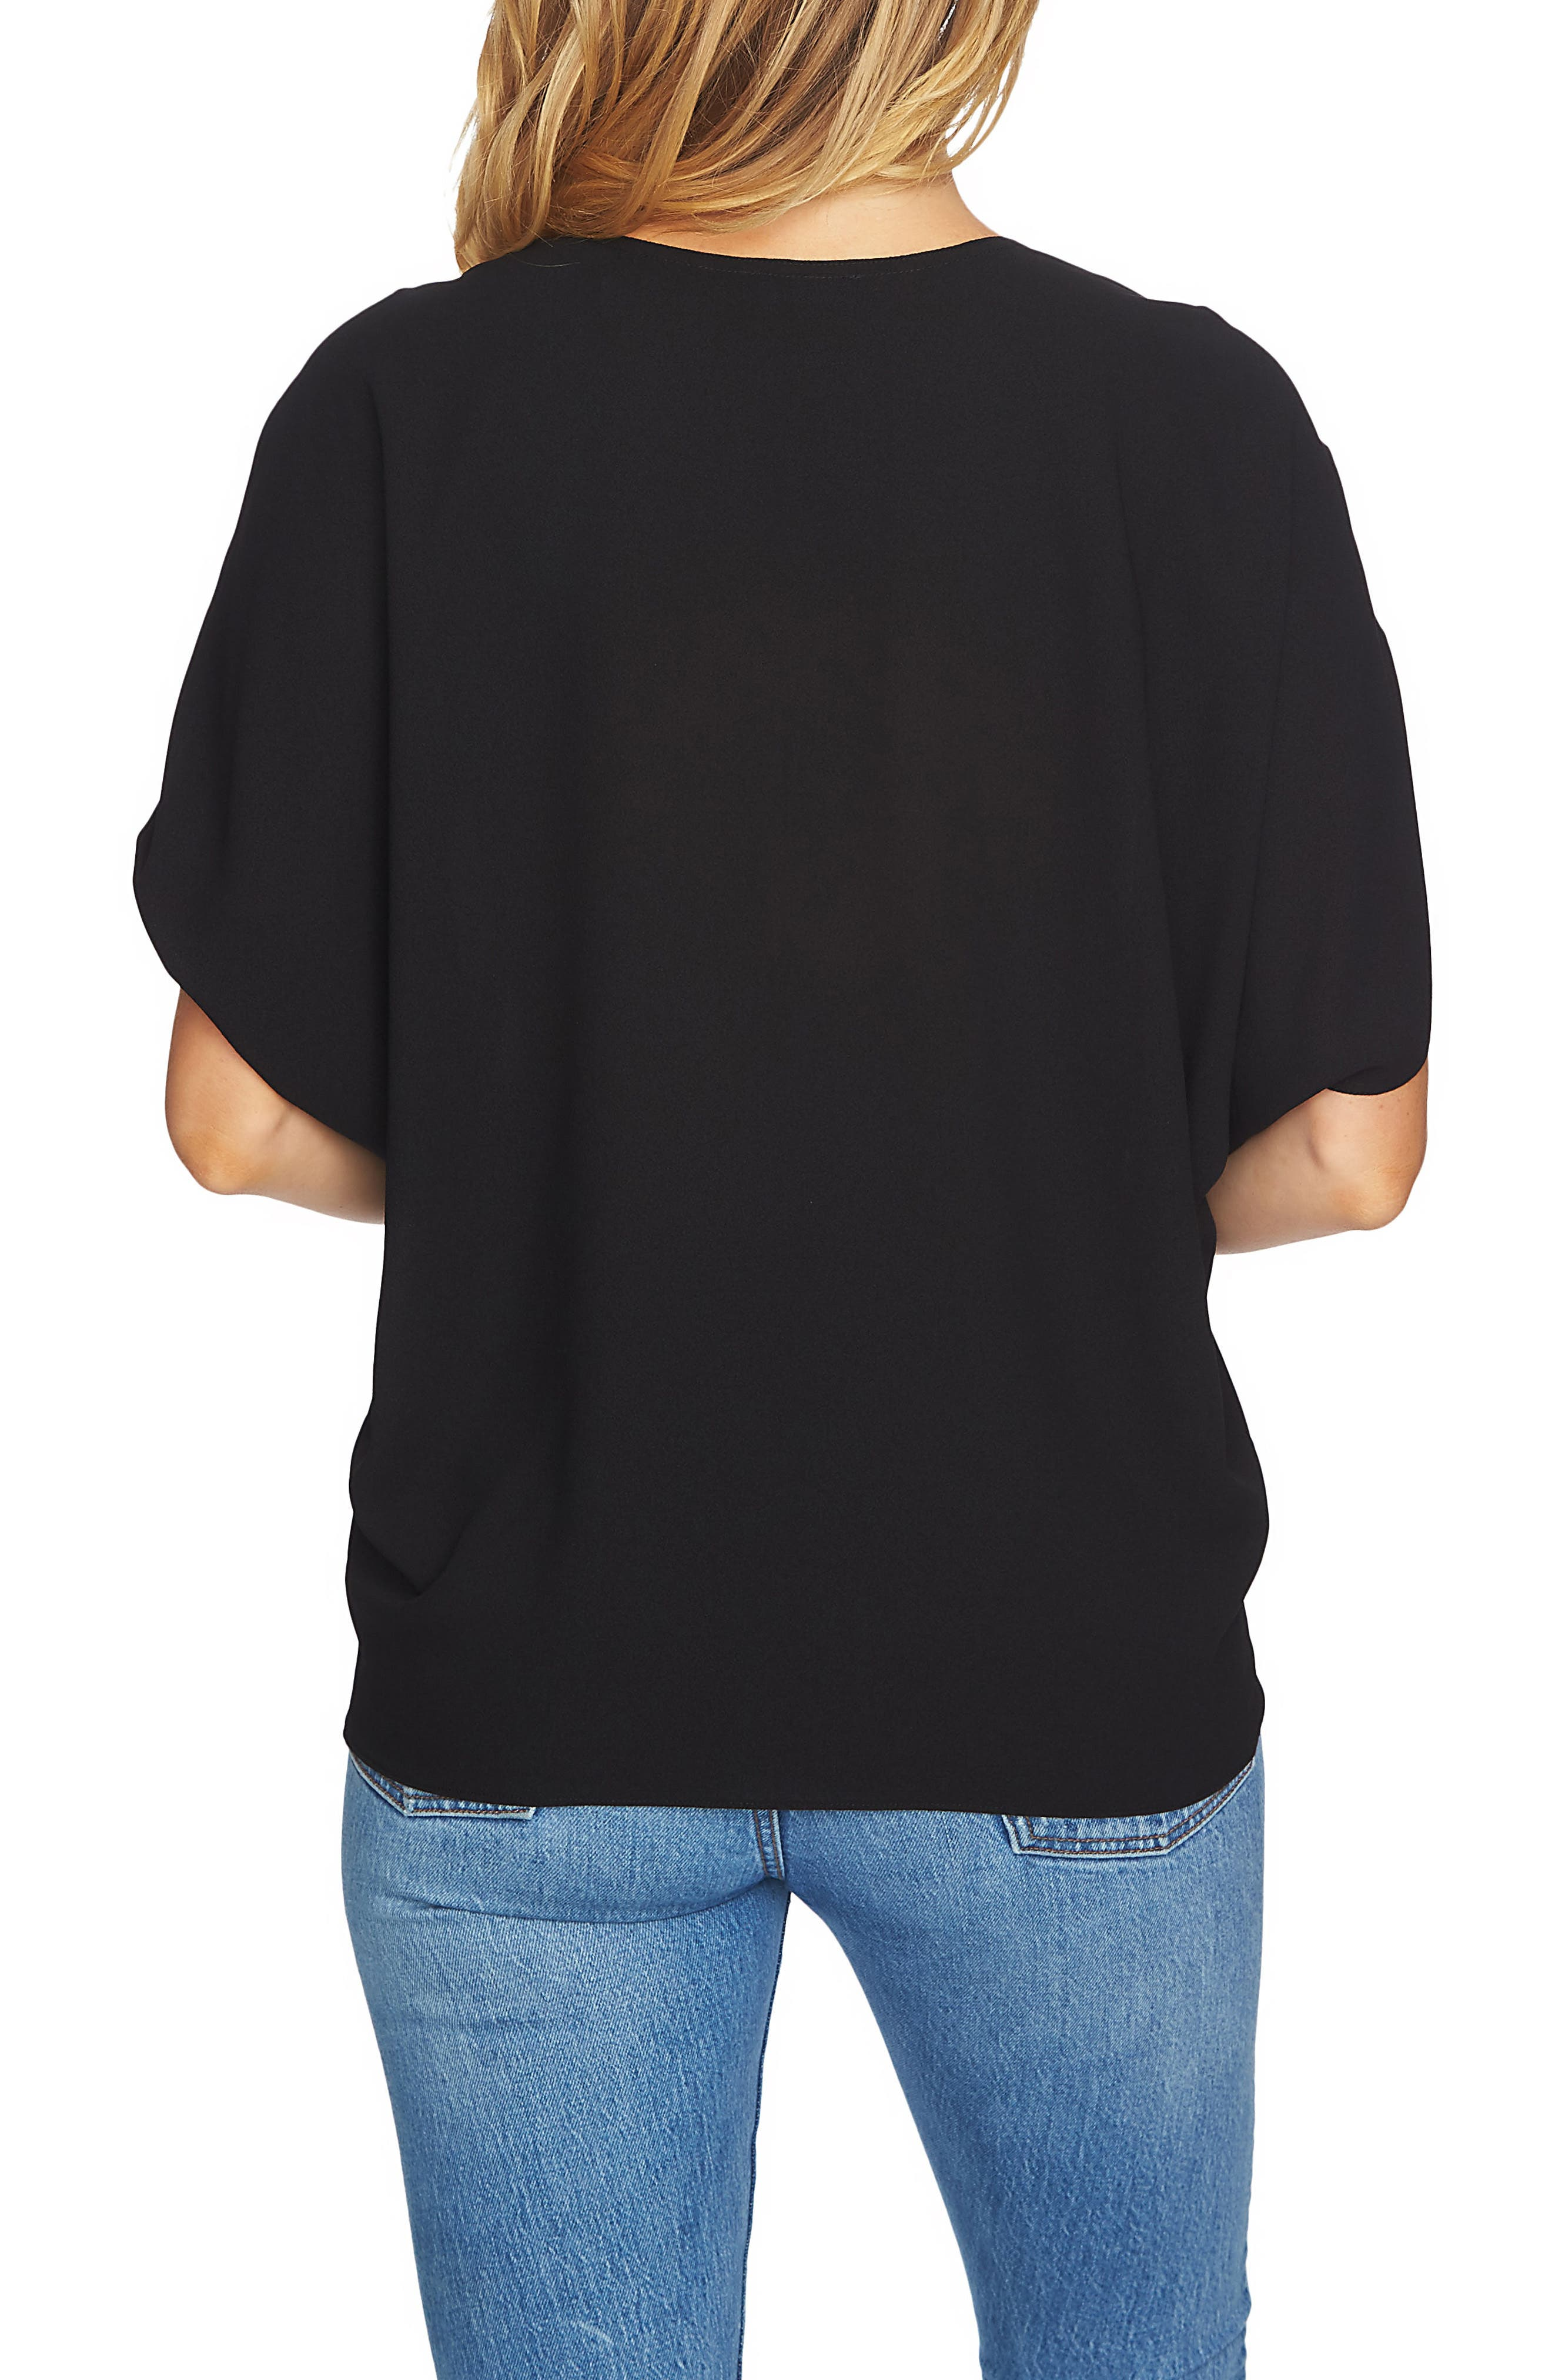 Cinch Sleeve Blouse,                             Alternate thumbnail 2, color,                             060-Rich Black